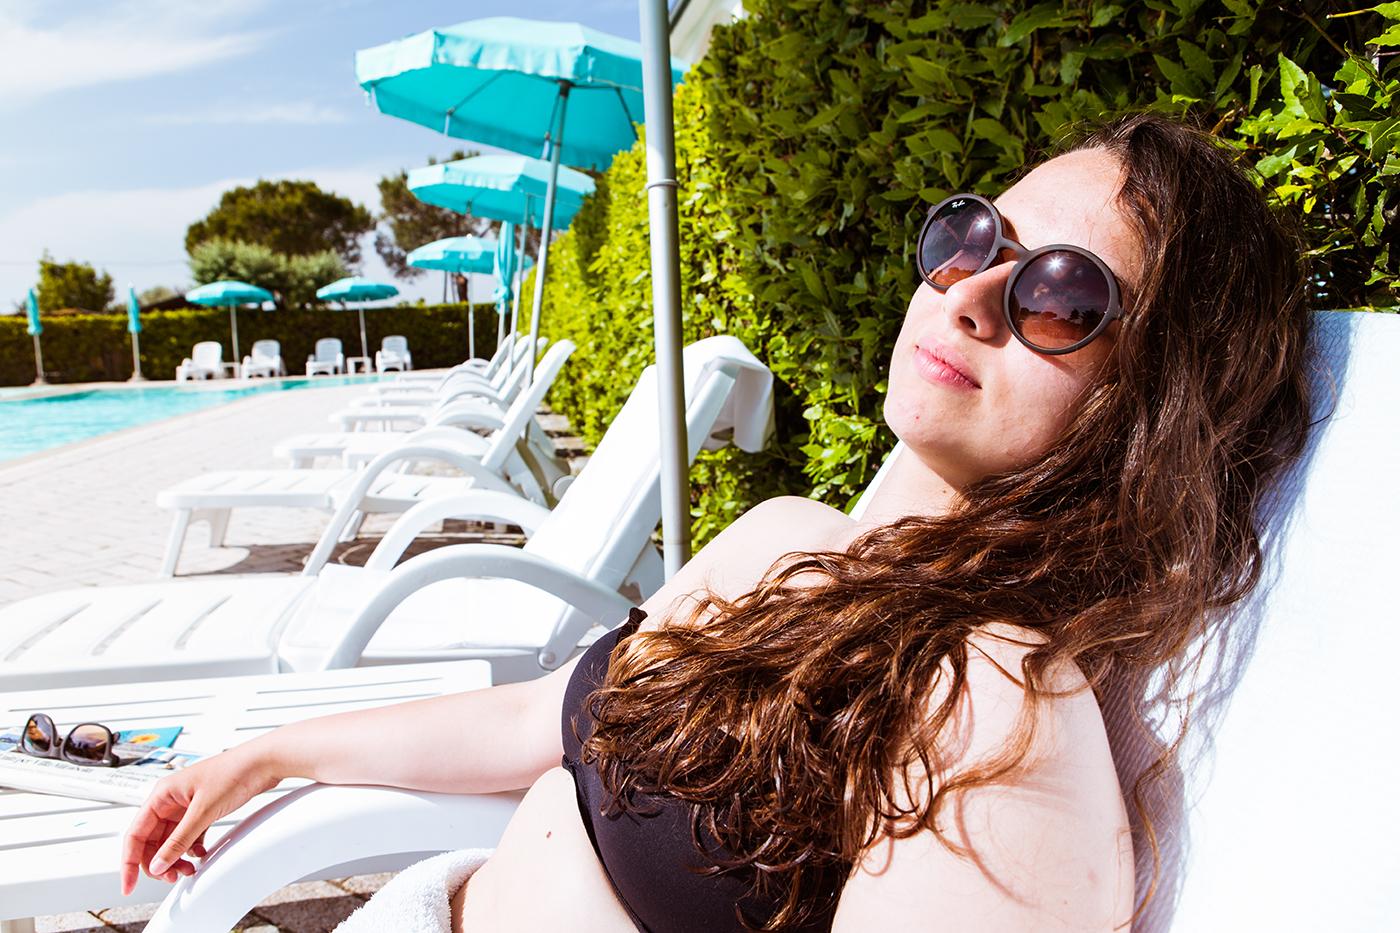 Hotel Residence La Ventola - Piscina e Relax